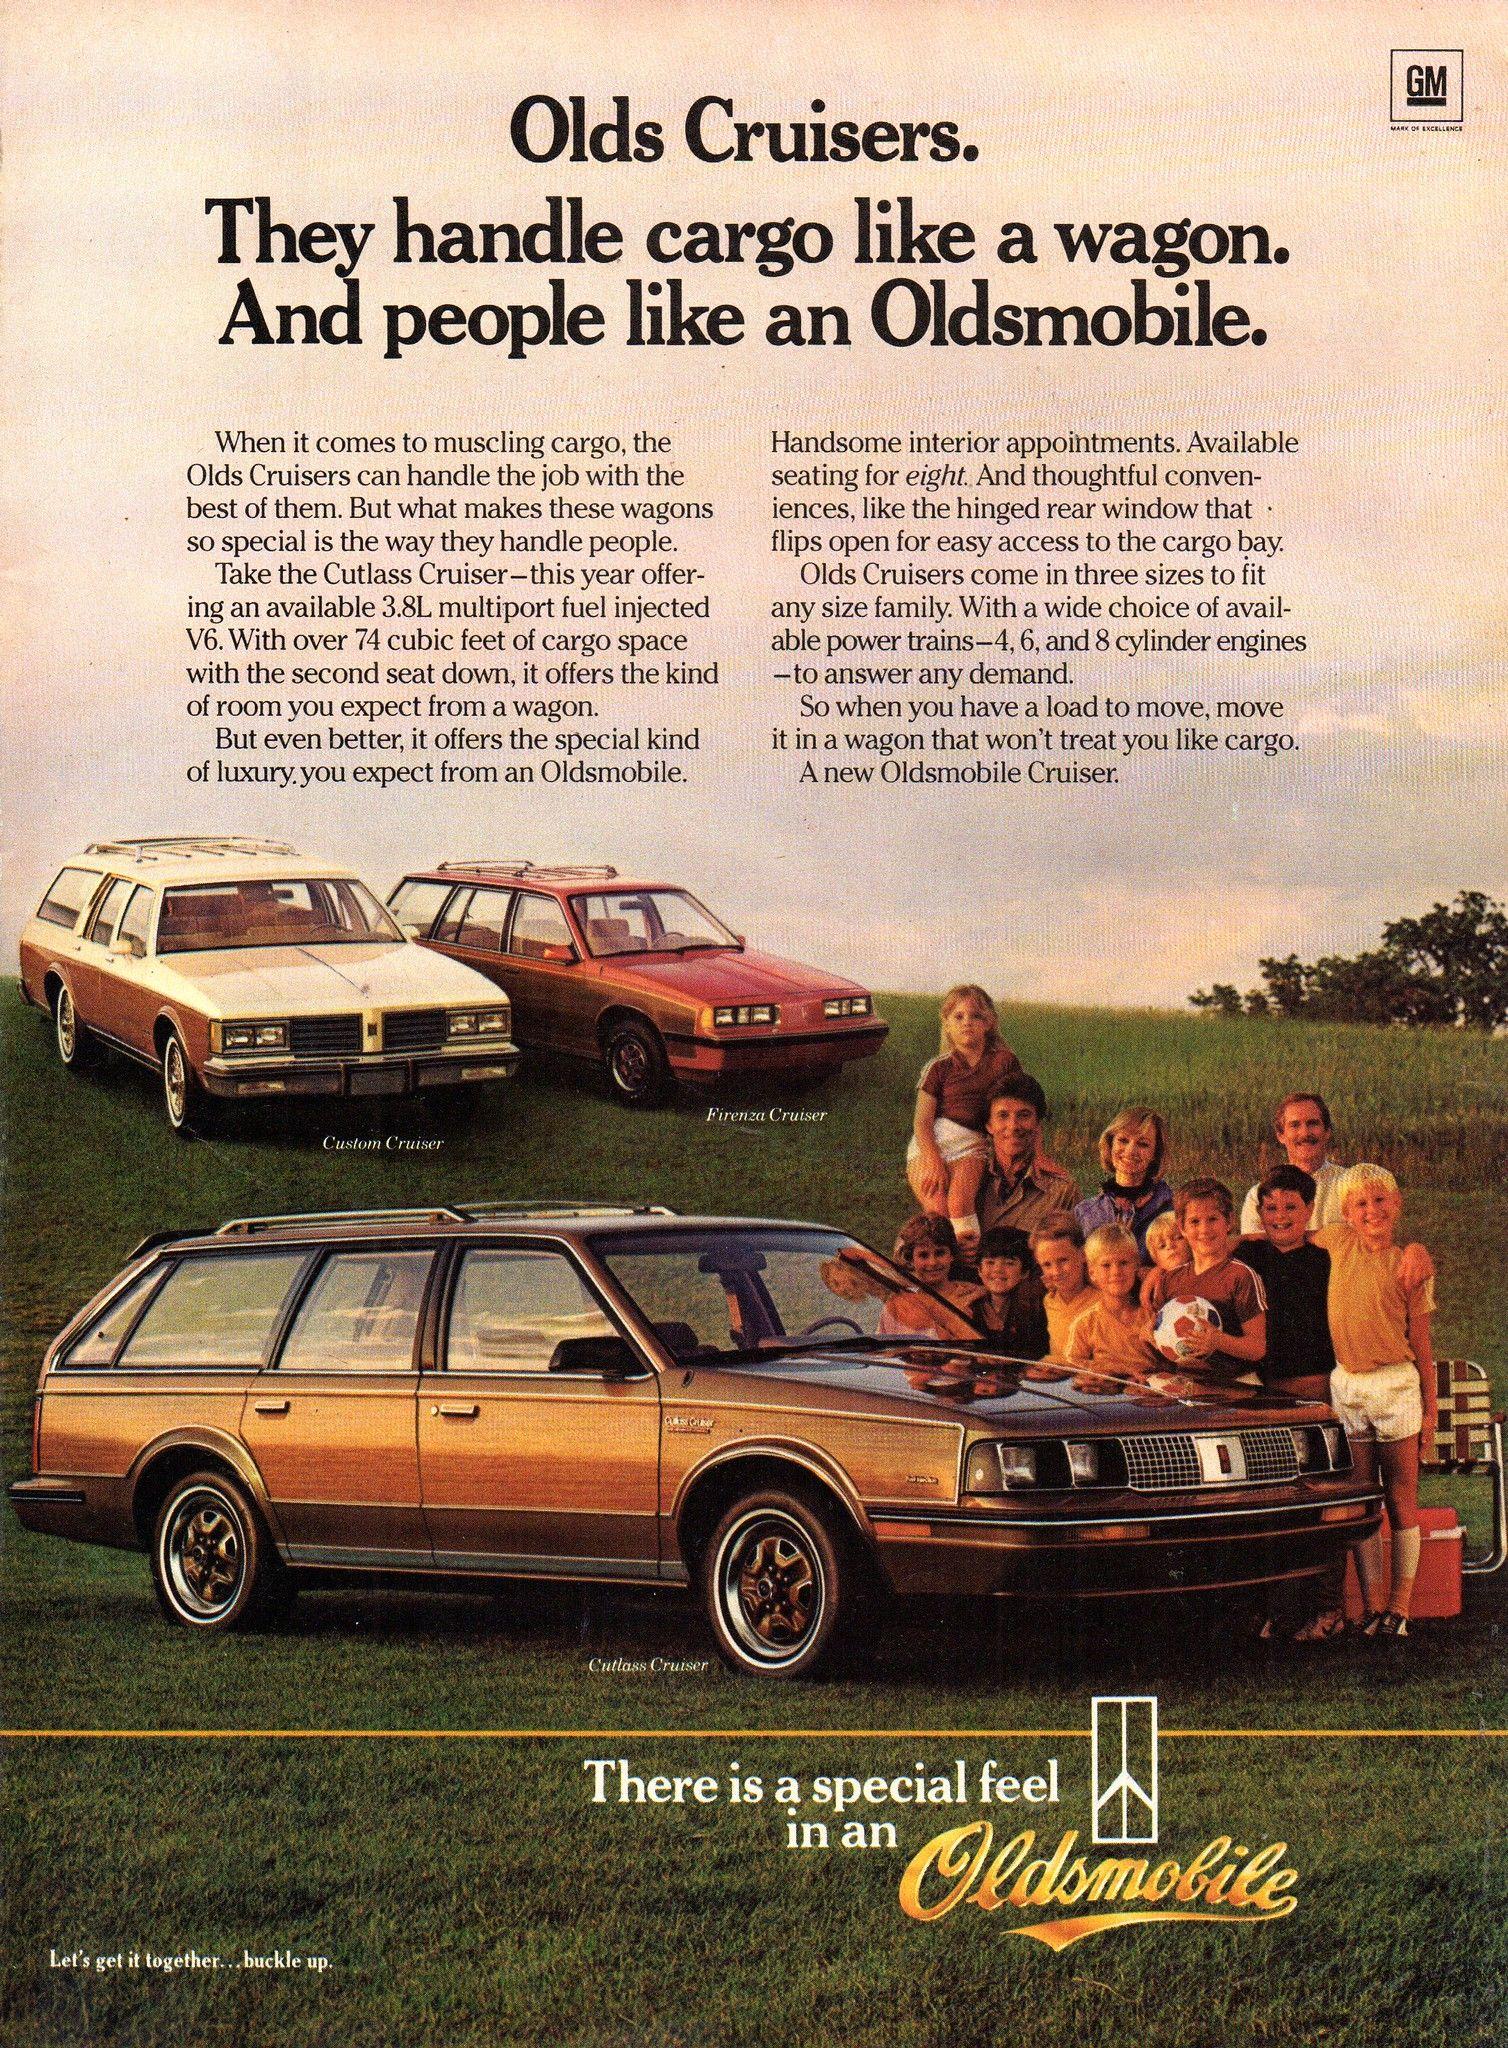 1985 Oldsmobile Cutlass Cruiser Furenza Cruiser Custom Cruiser Wagons Usa Original Magazine Advertisement Oldsmobile Wagons Station Wagon